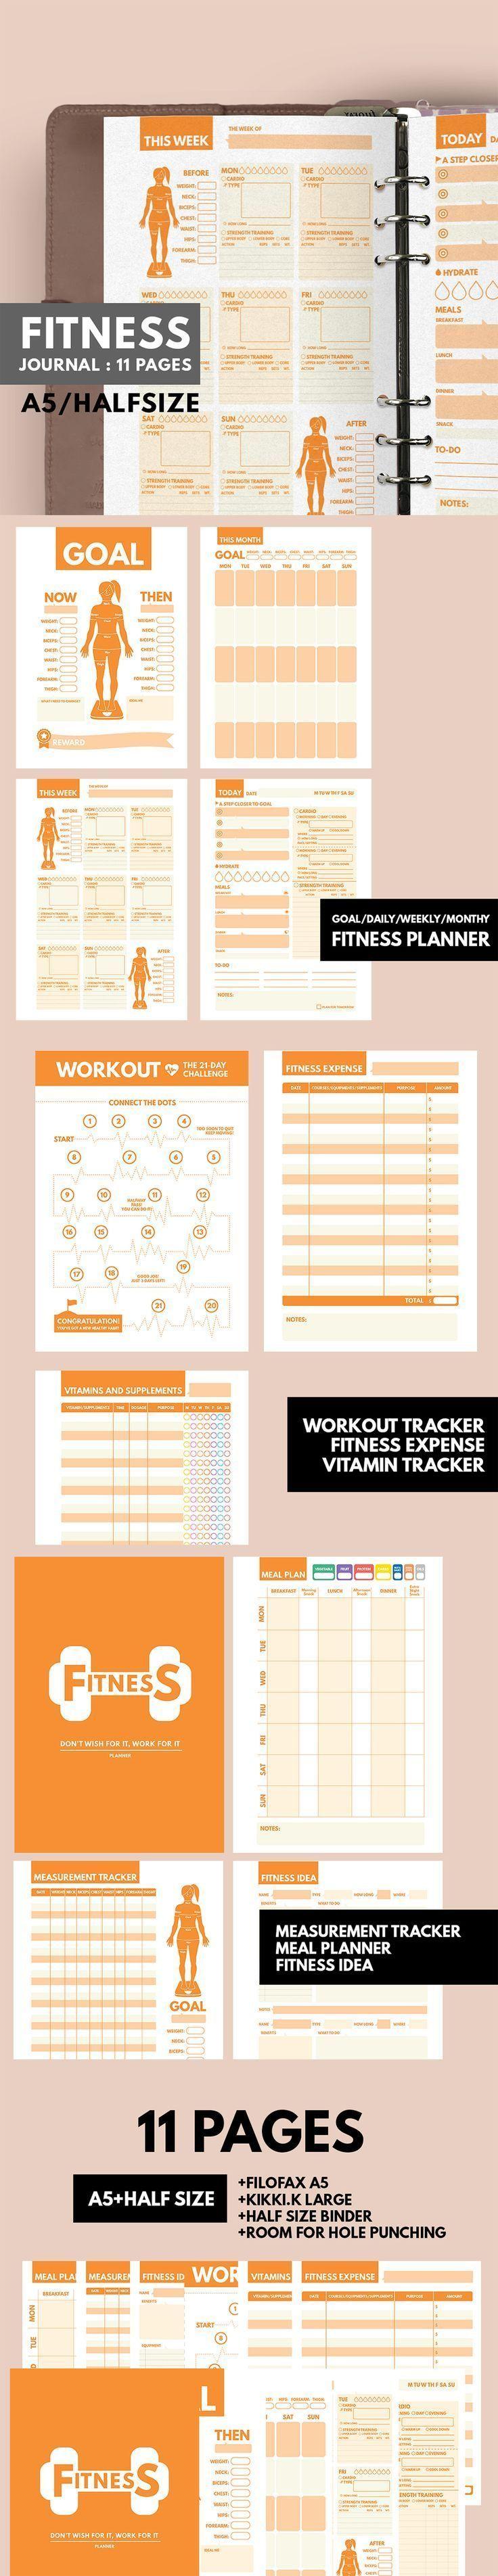 #filofax #Fitness #health #Insert #Journal #planner #workout         Fitness Planner Printable ▹ for...